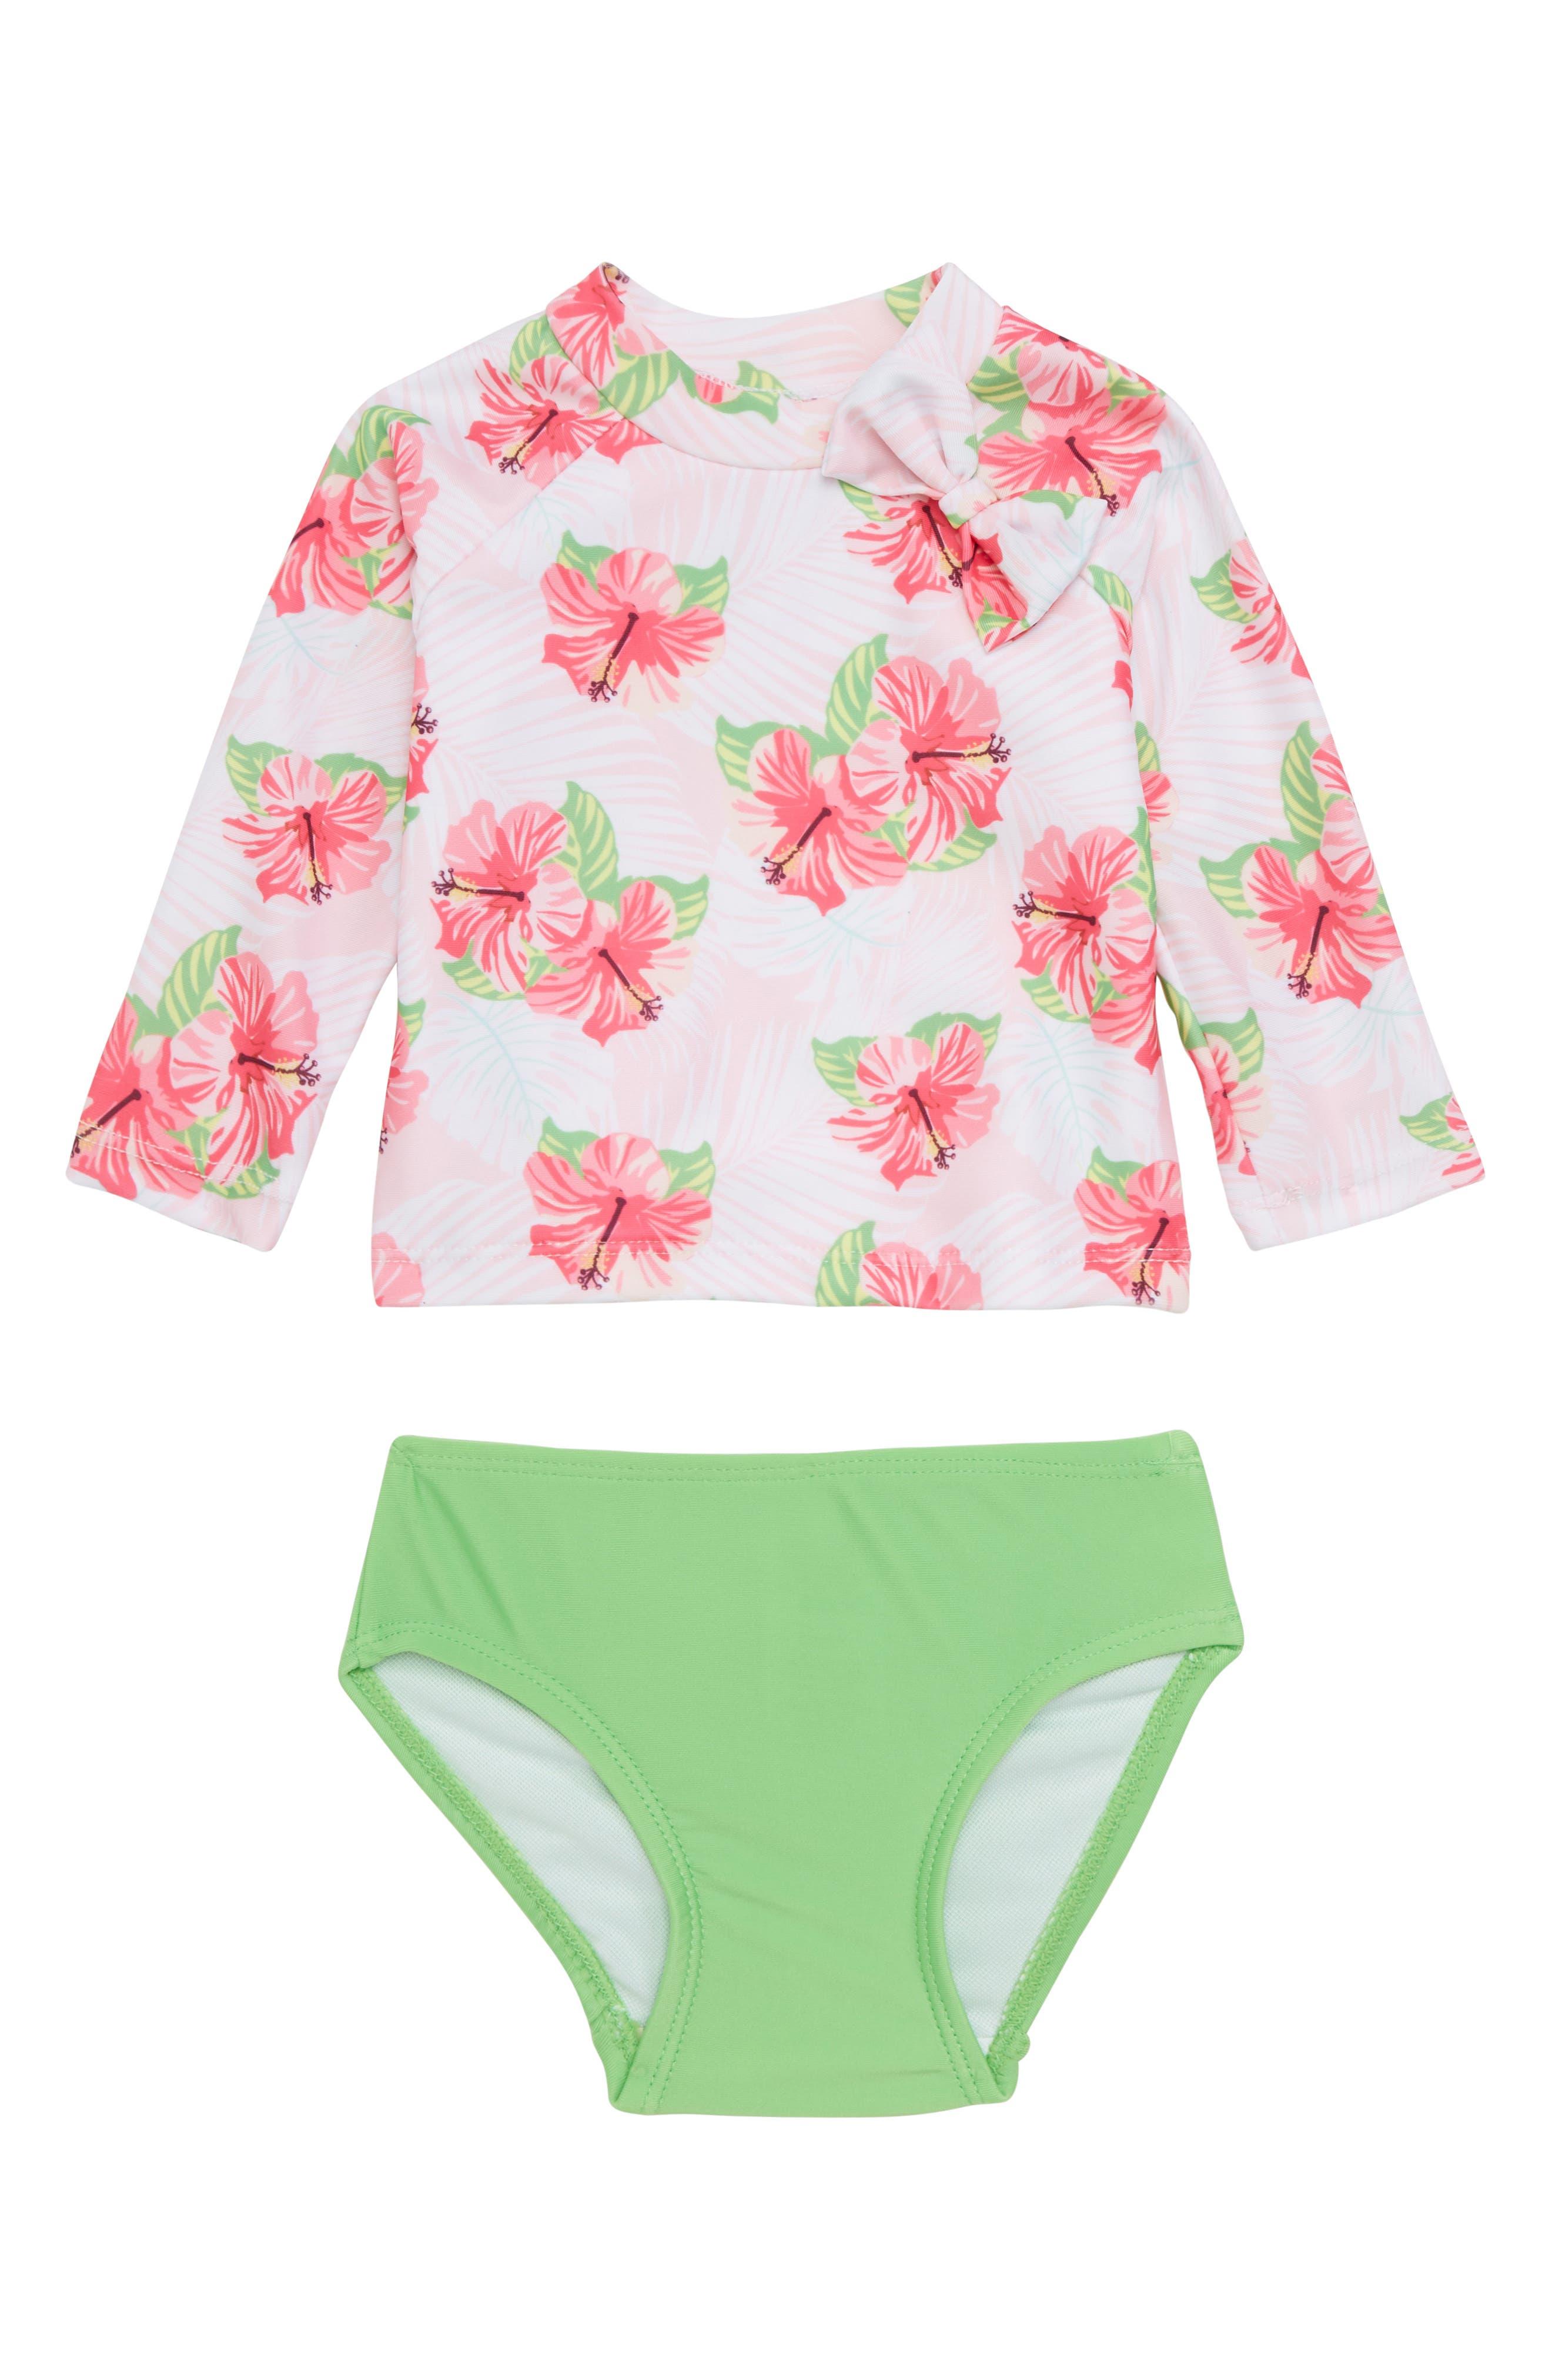 Hibiscus Splash Two-Piece Rashguard Swimsuit,                         Main,                         color, 699